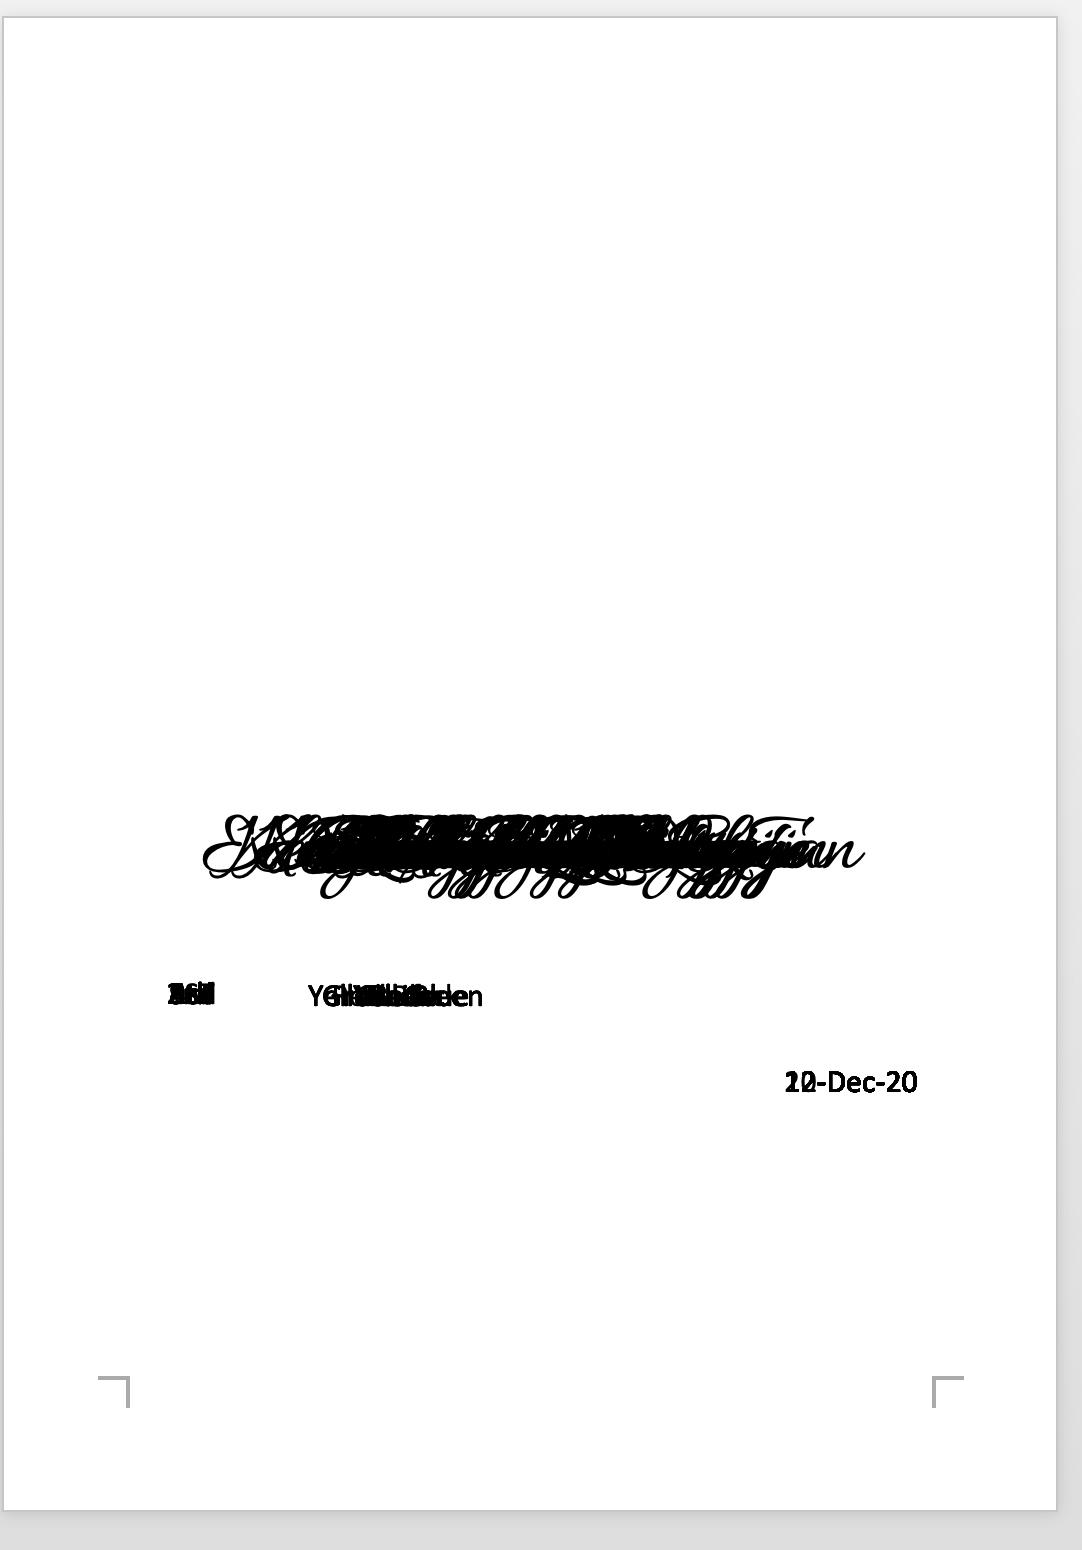 Screenshot-2020-11-20-at-3.47.54-PM.png